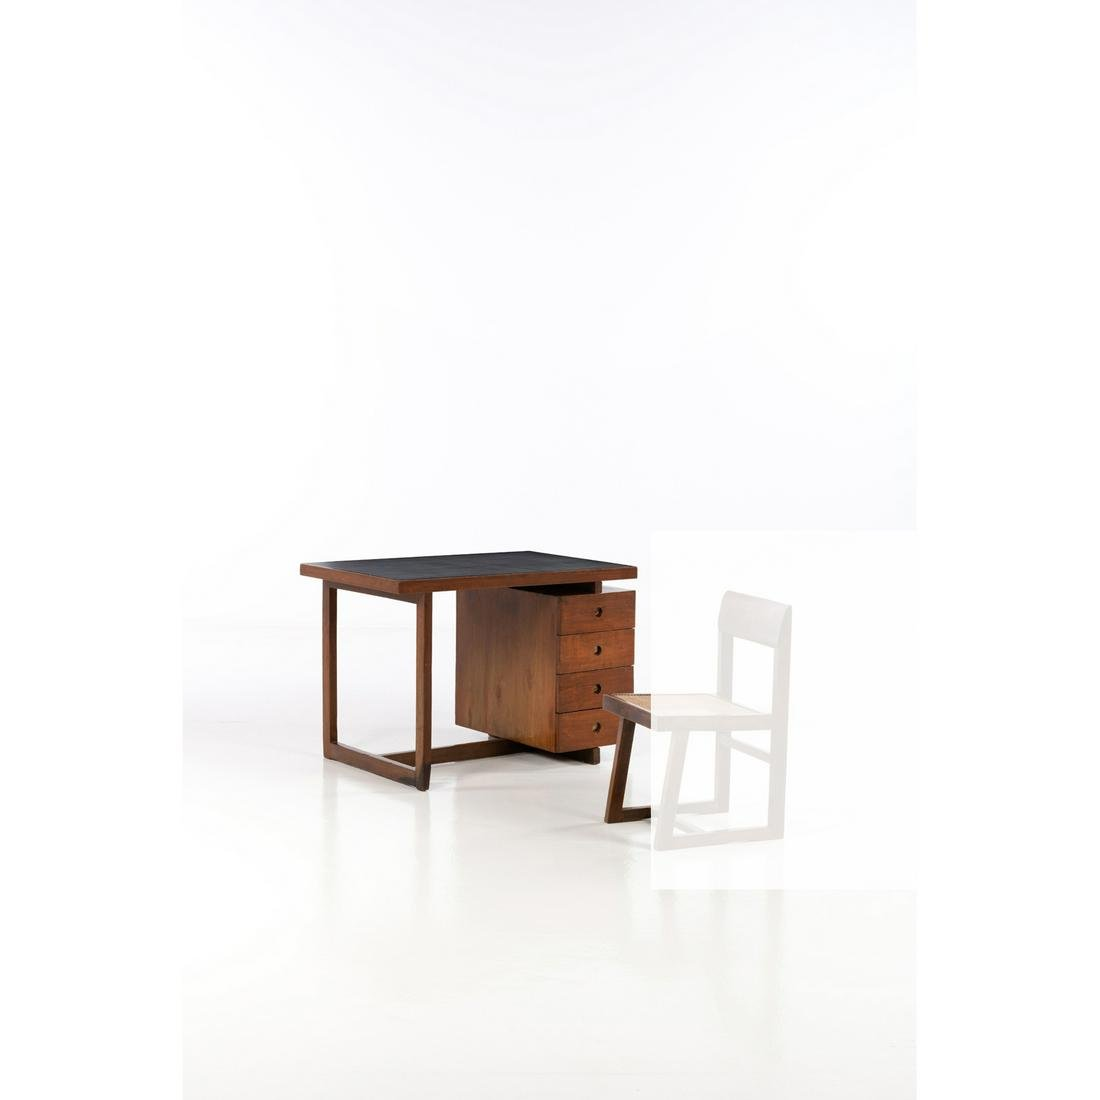 Pierre Jeanneret (1896-1967) Desk Teak, leather and